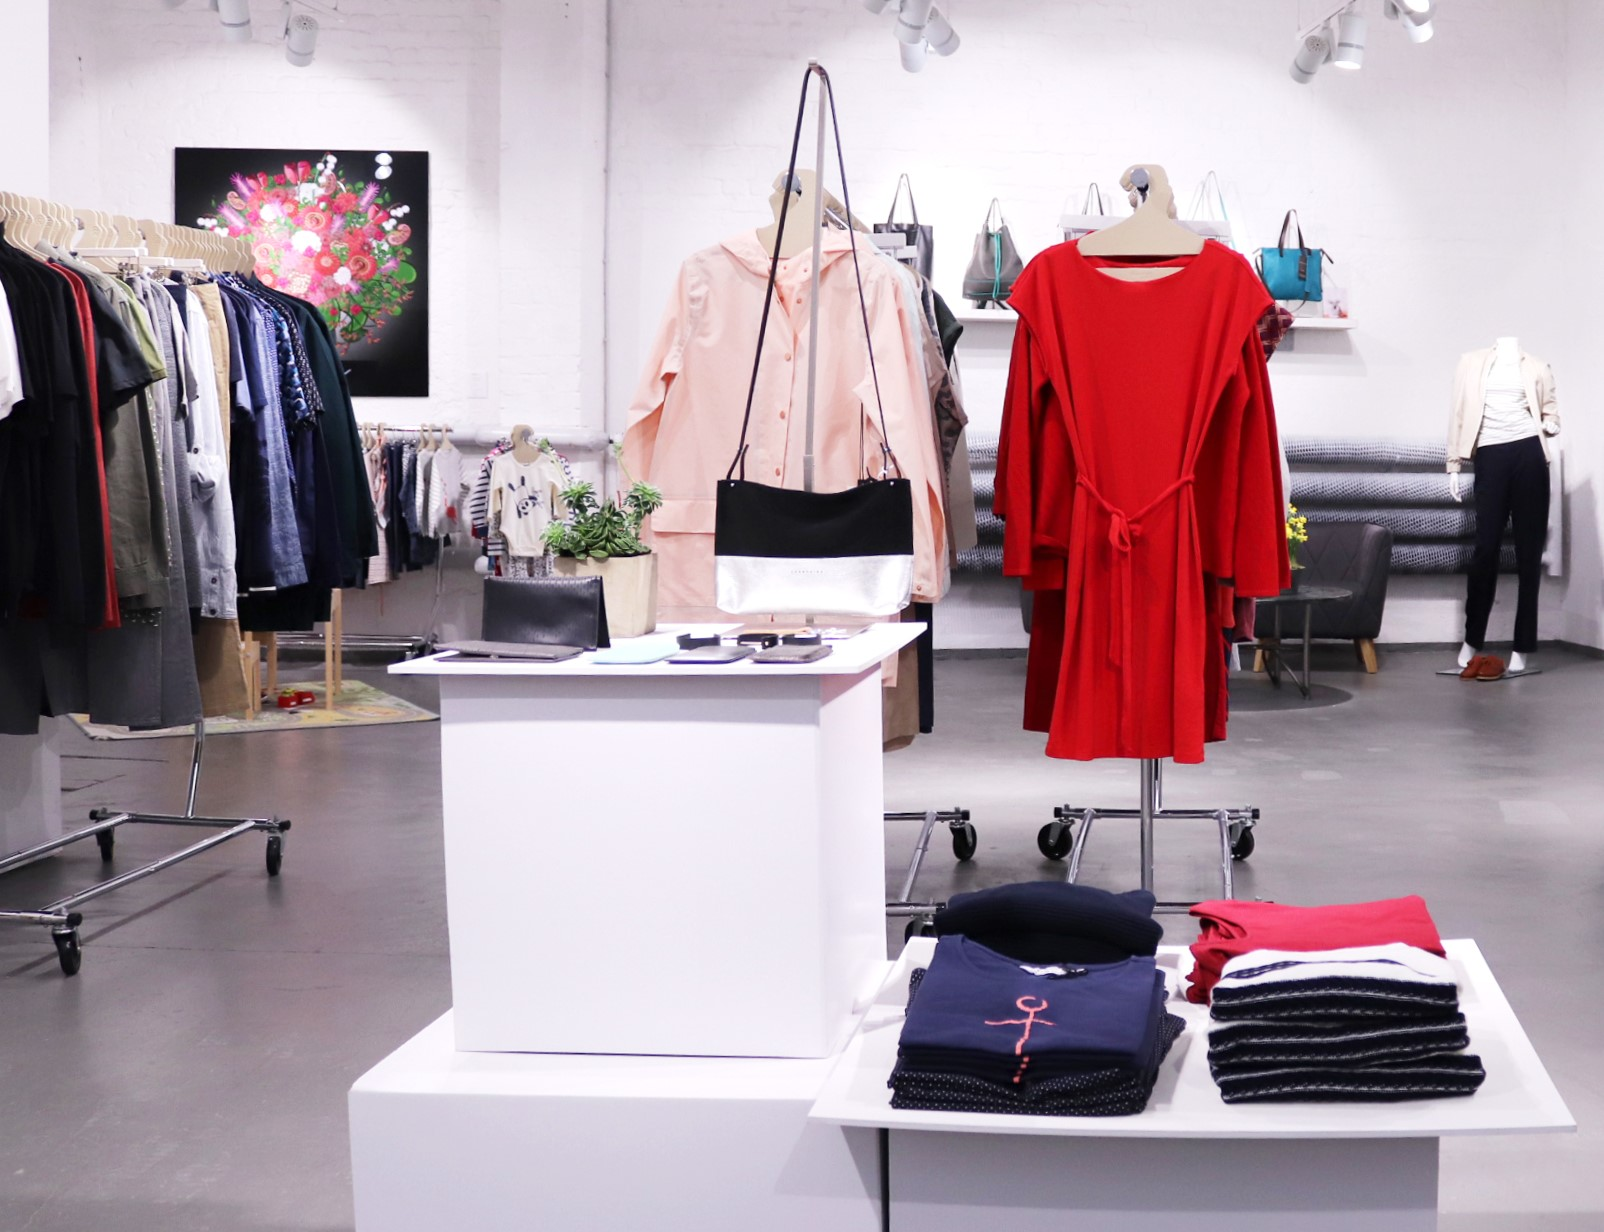 https://buygoodstuff.de/wp-content/uploads/2019/01/Bild-1b-roberta_organic_fashion_eingang.jpg